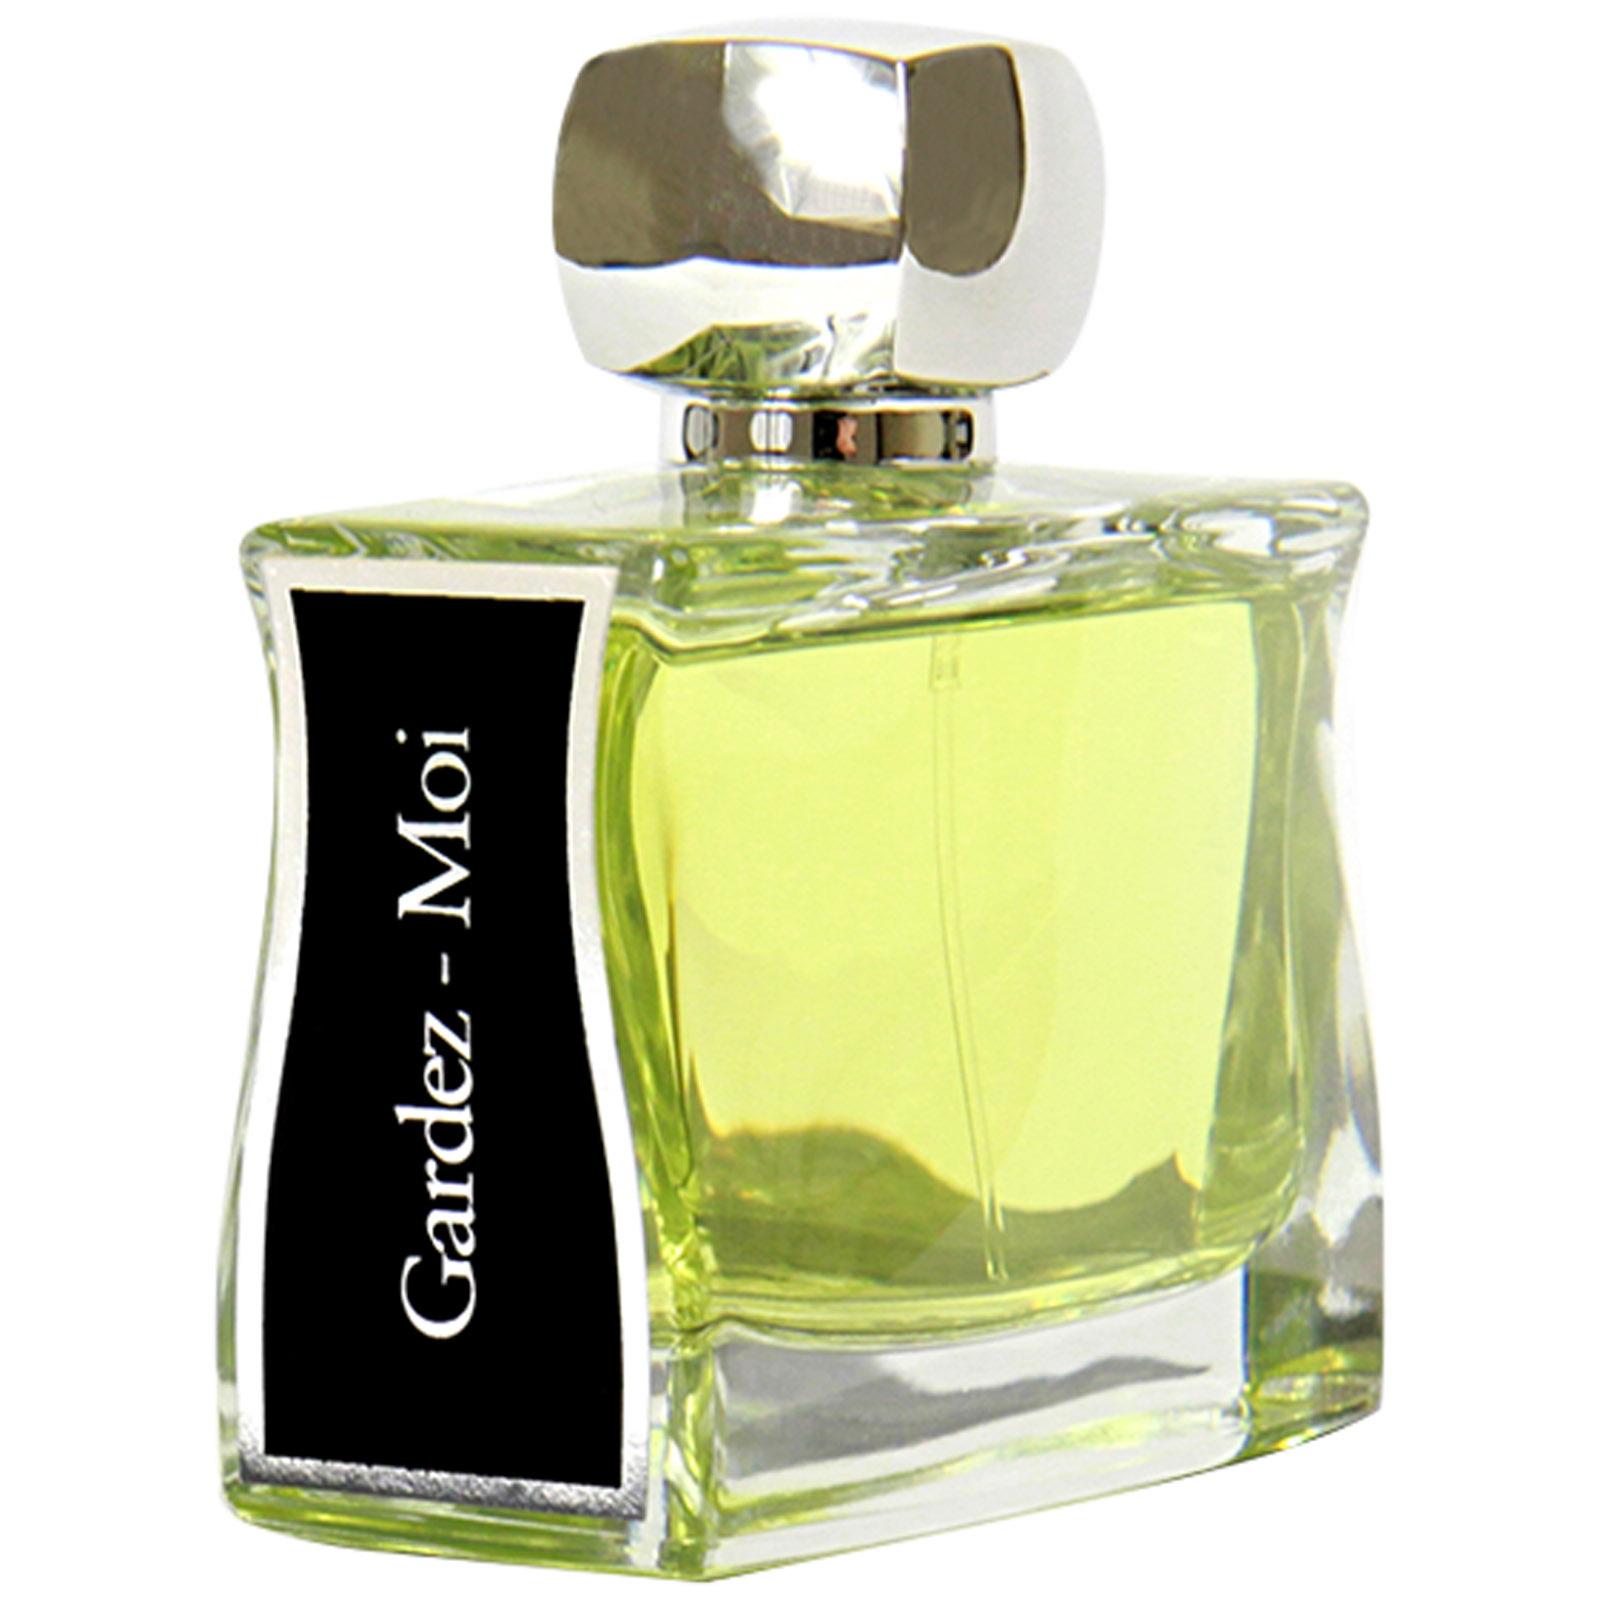 Gardez-moi profumo eau de parfum 100 ml